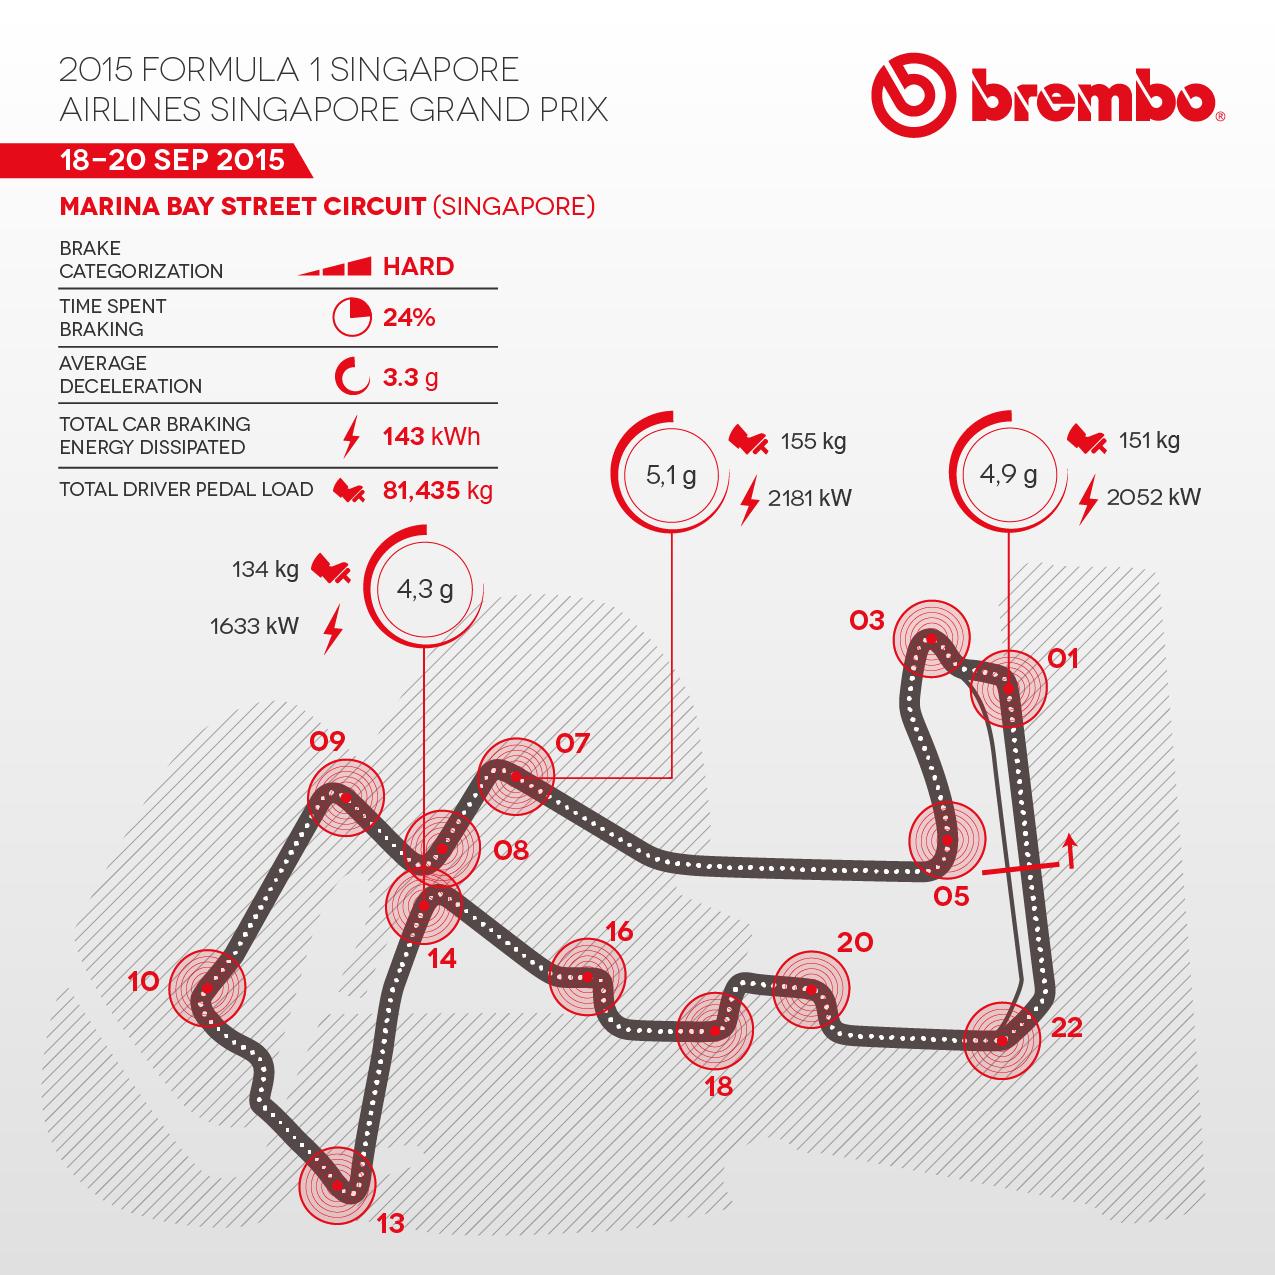 Brembo Brake Facts - Singapore